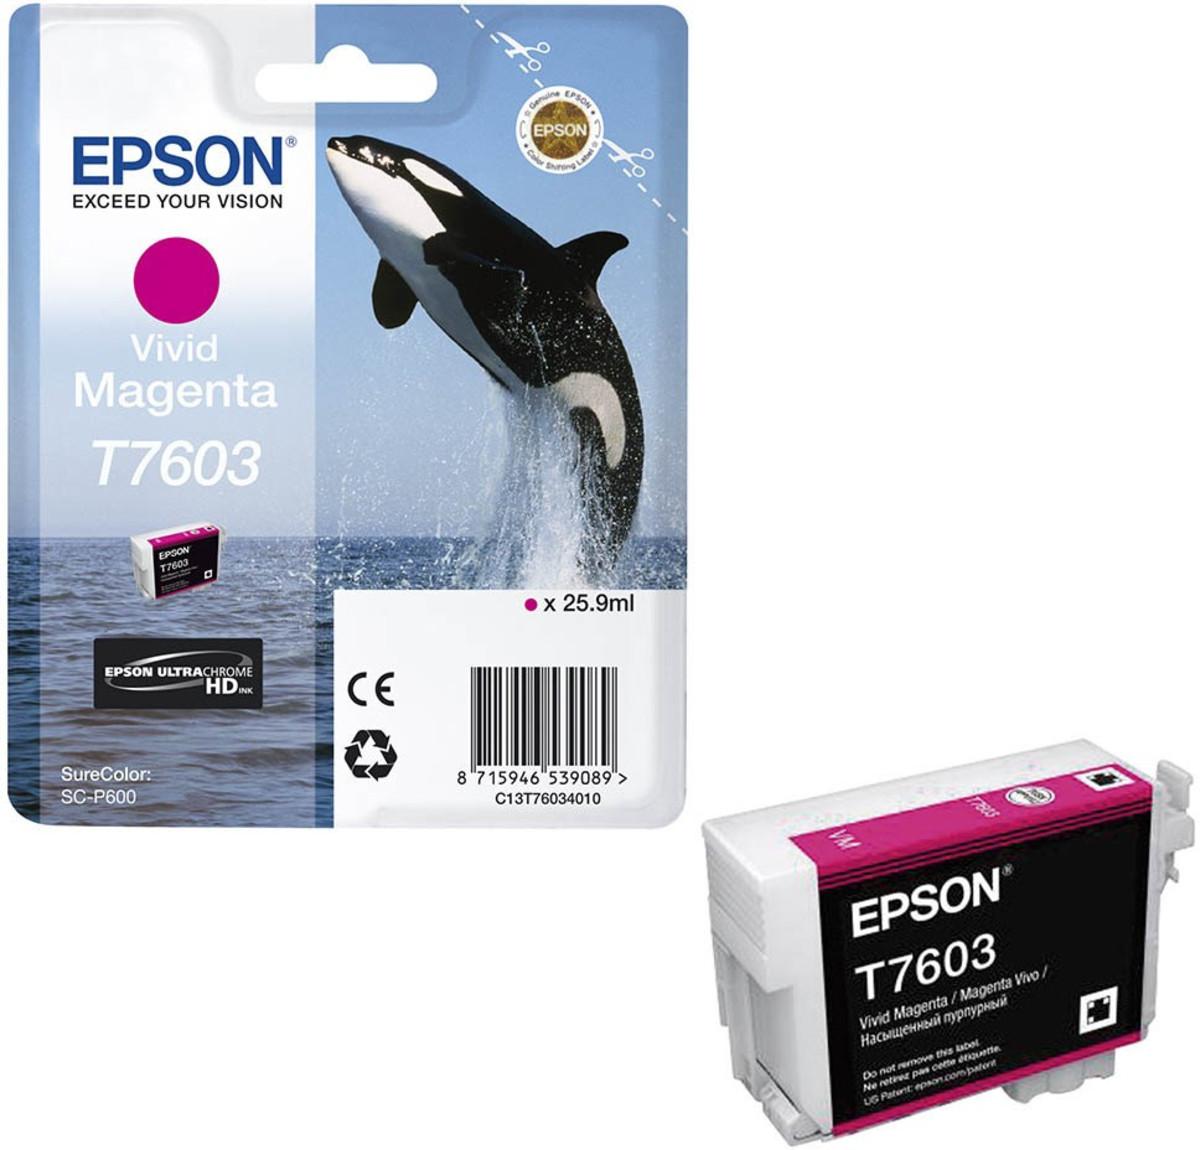 Epson 760 Vivid Magenta Inkjet Cartridge